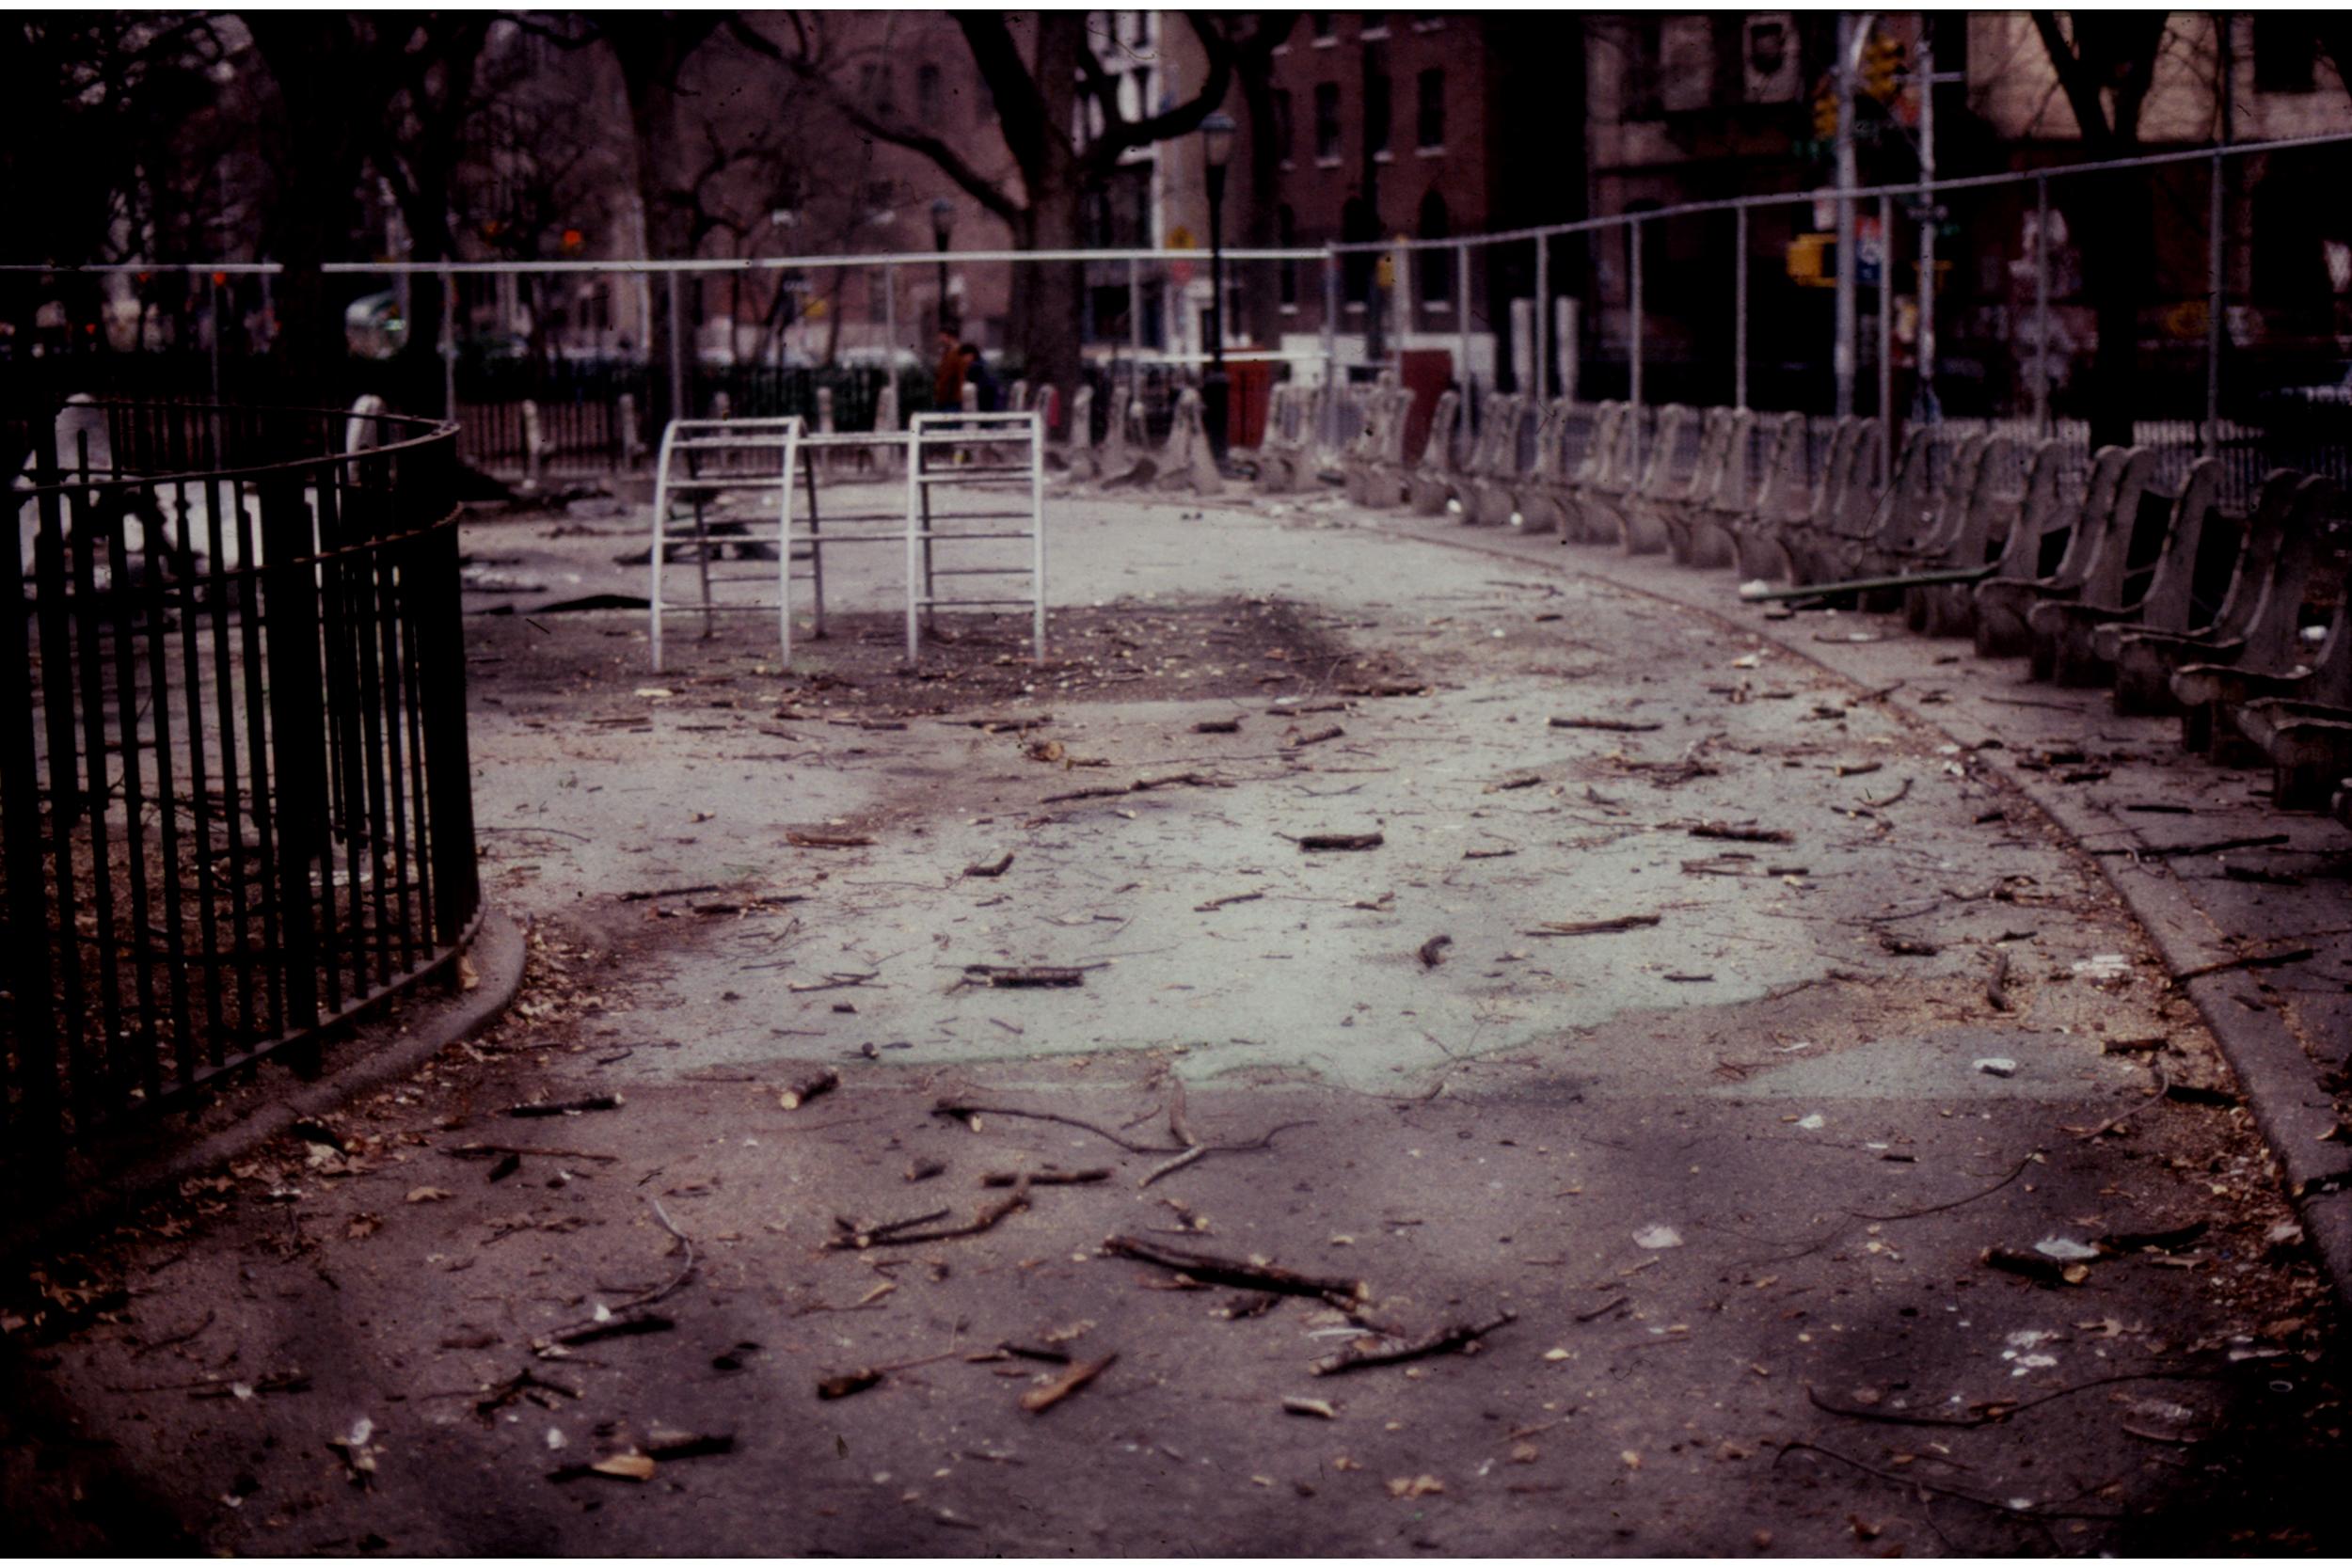 Tompkins Square Park, February 1990